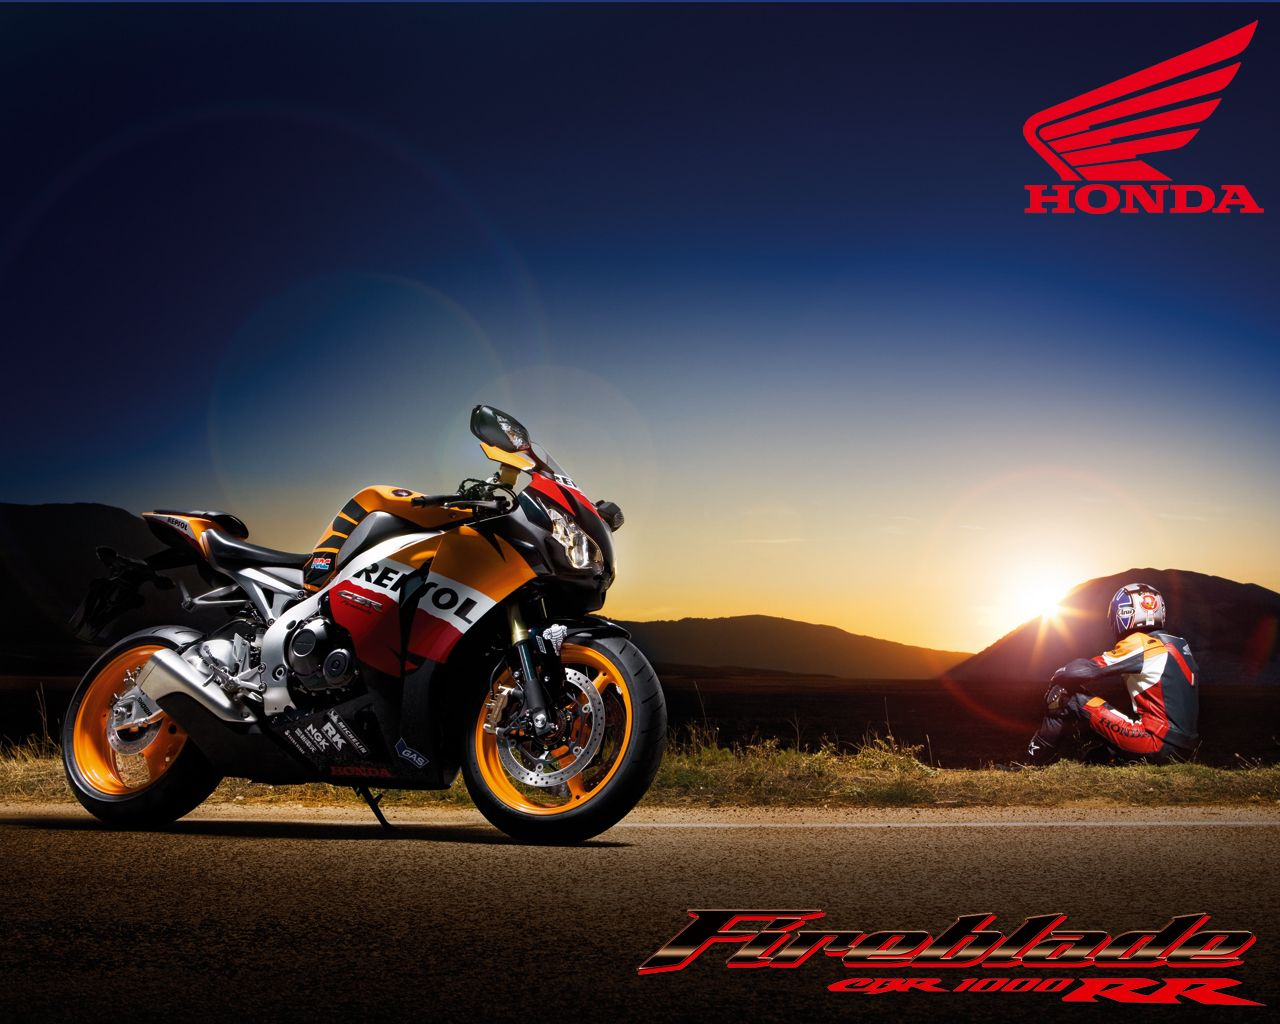 Check out wwwspeedfireusacom Moto Love Honda bikes 1280x1024